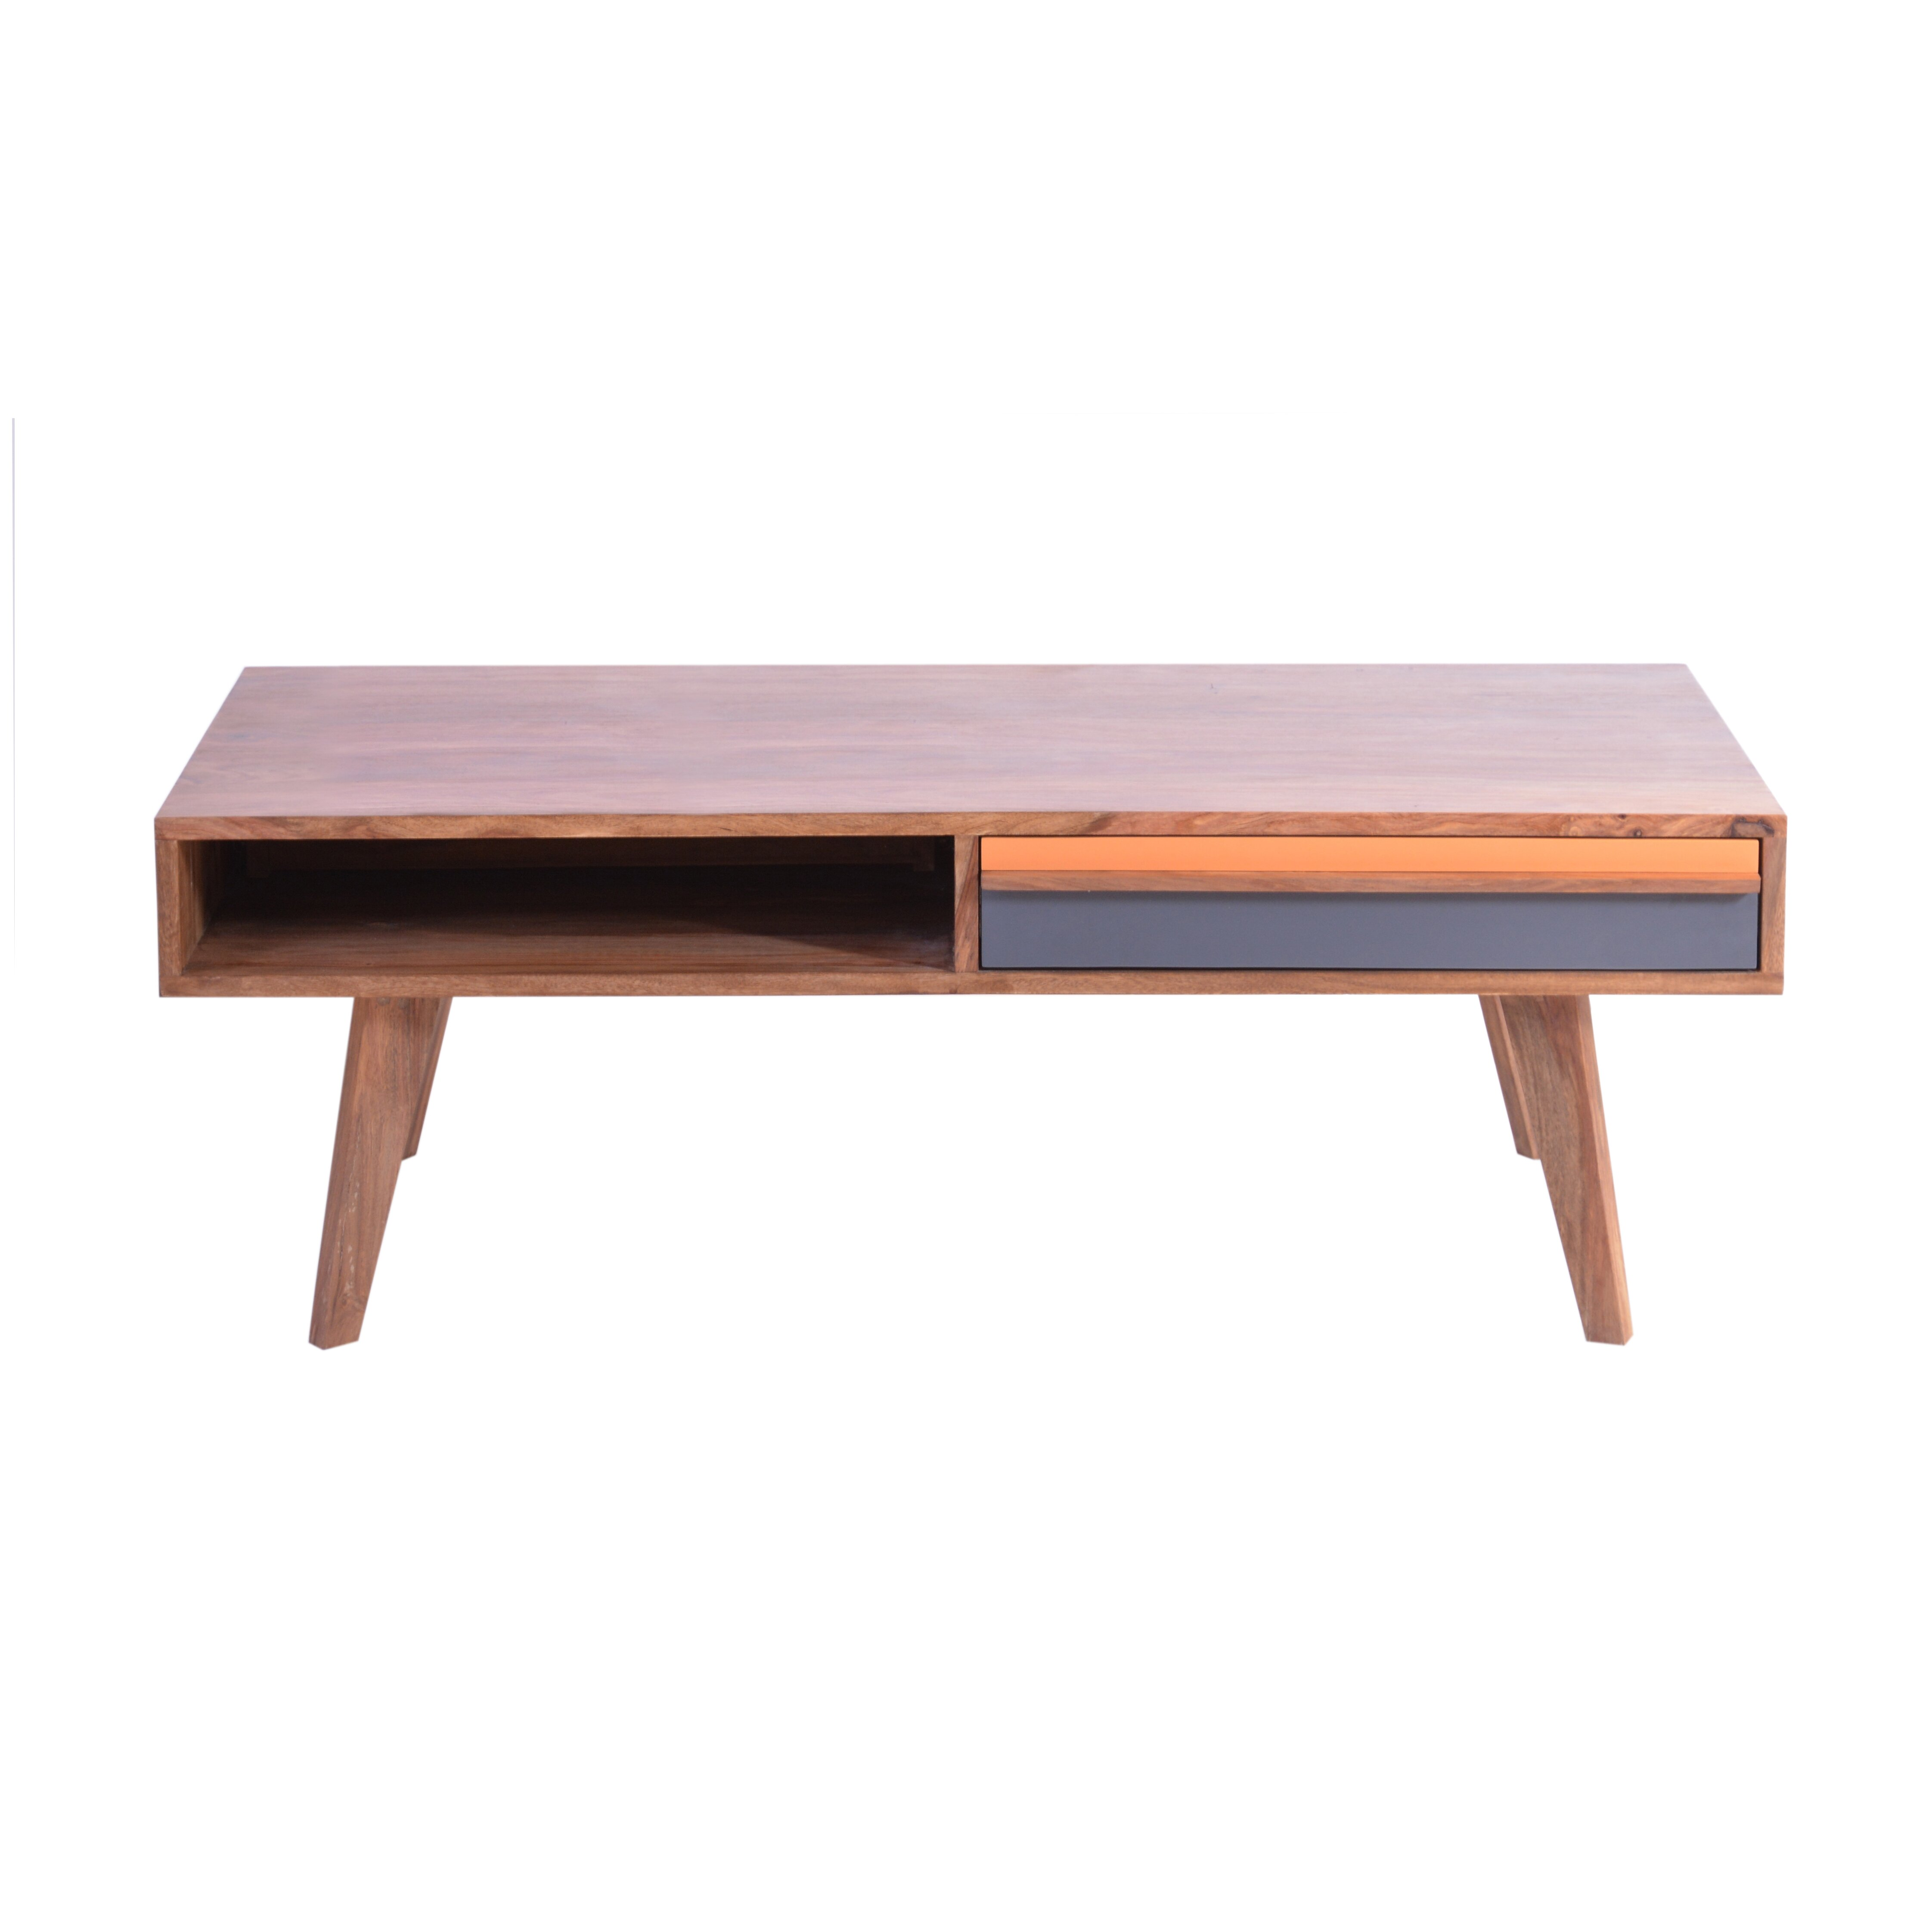 corrigan studio dunamuggy coffee table reviews wayfair. Black Bedroom Furniture Sets. Home Design Ideas